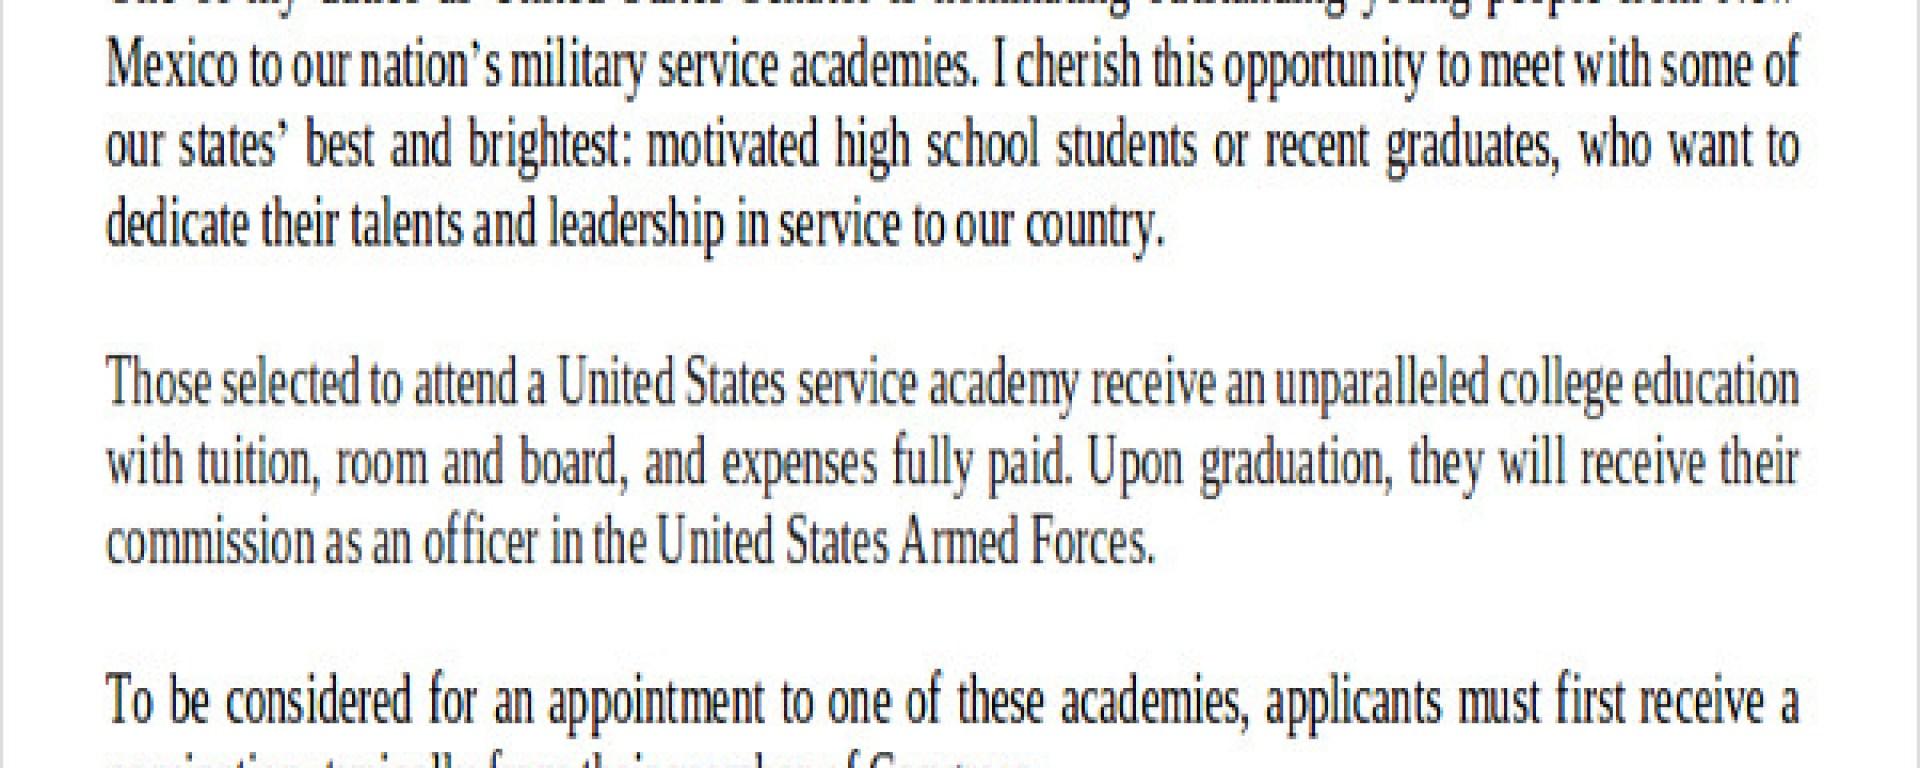 Naval Academy Essay Examples Rolores1989 Blog